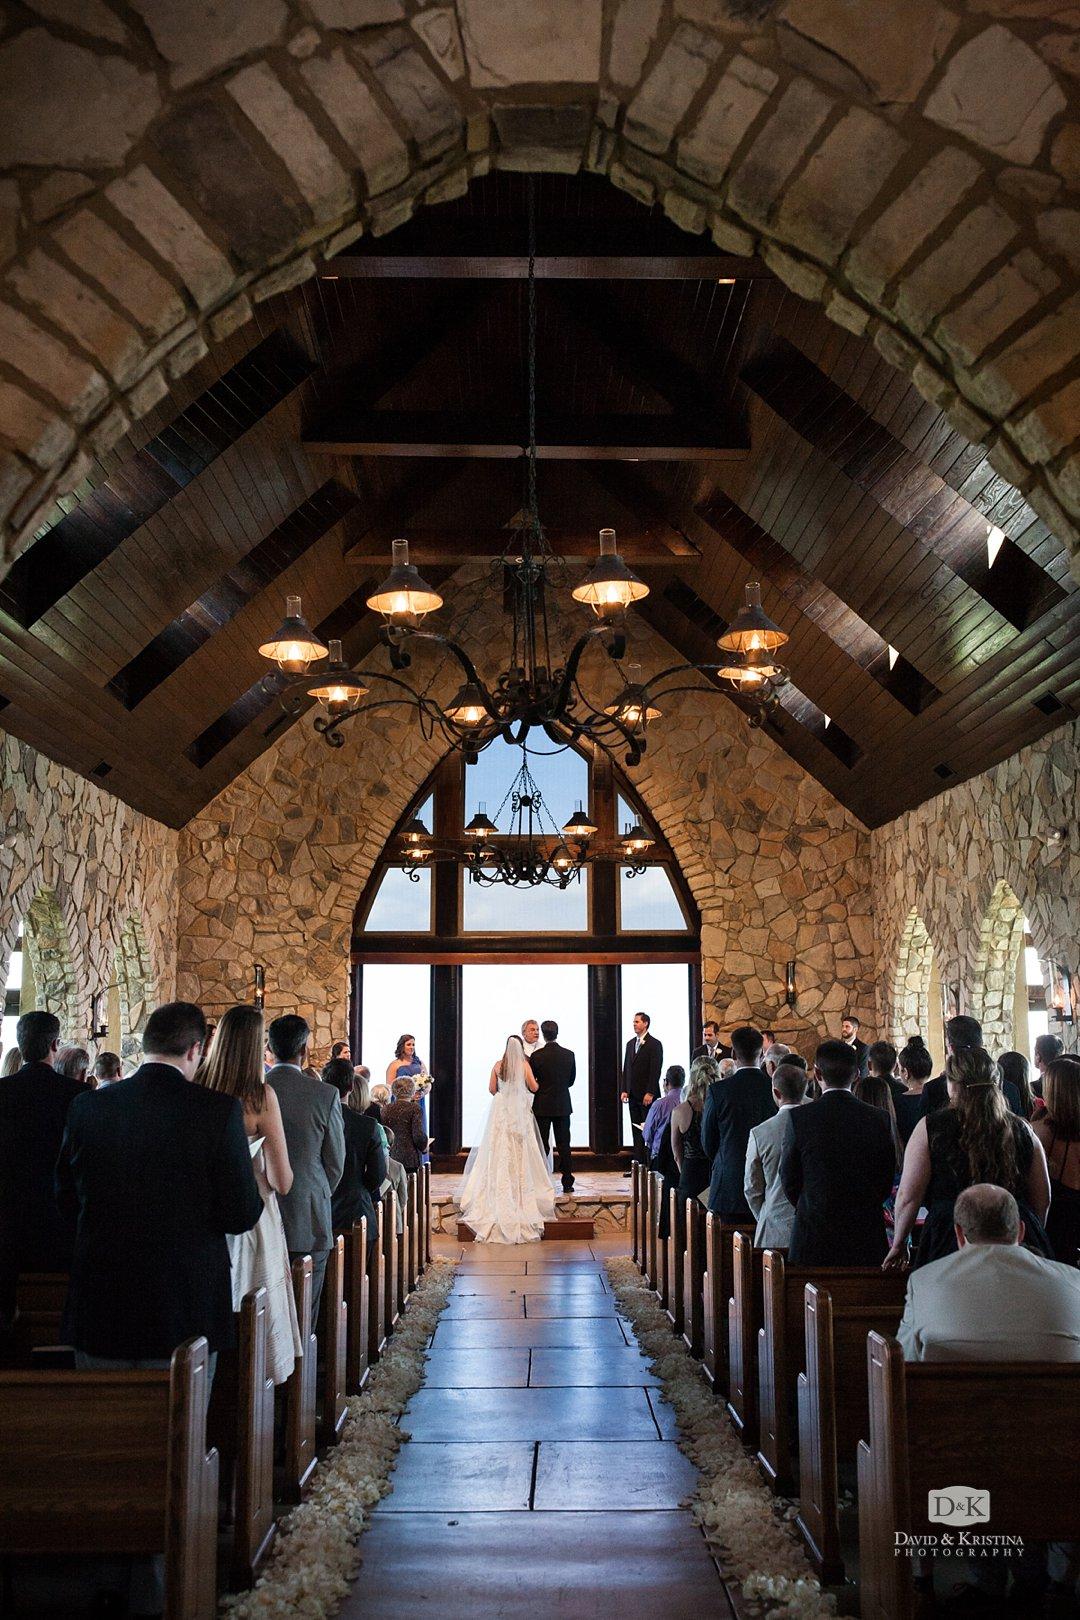 The Cliffs at Glassy wedding chapel